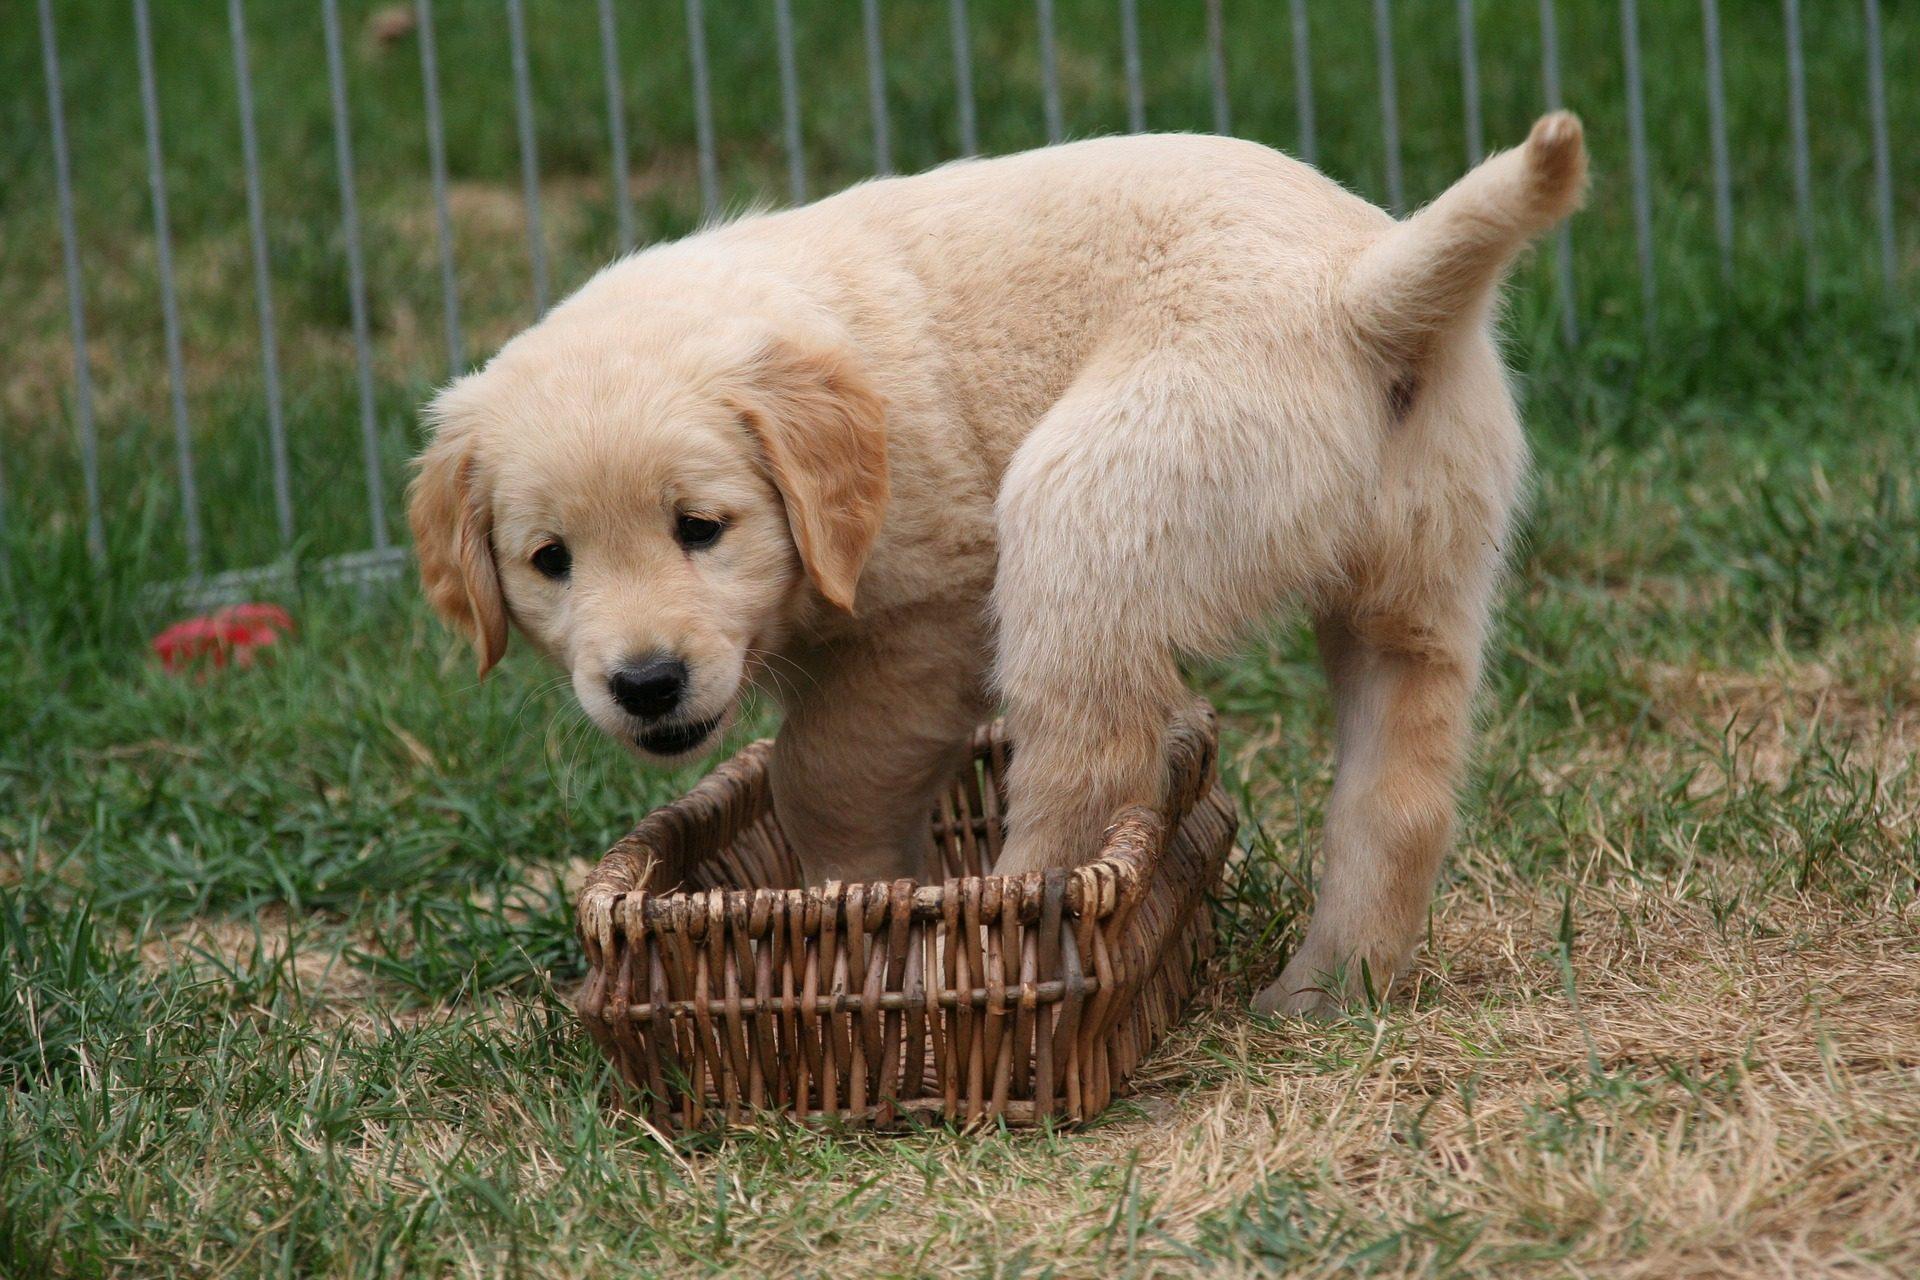 Fondo de pantalla de perro cr a mascota juego jard n - Jardin para perros ...